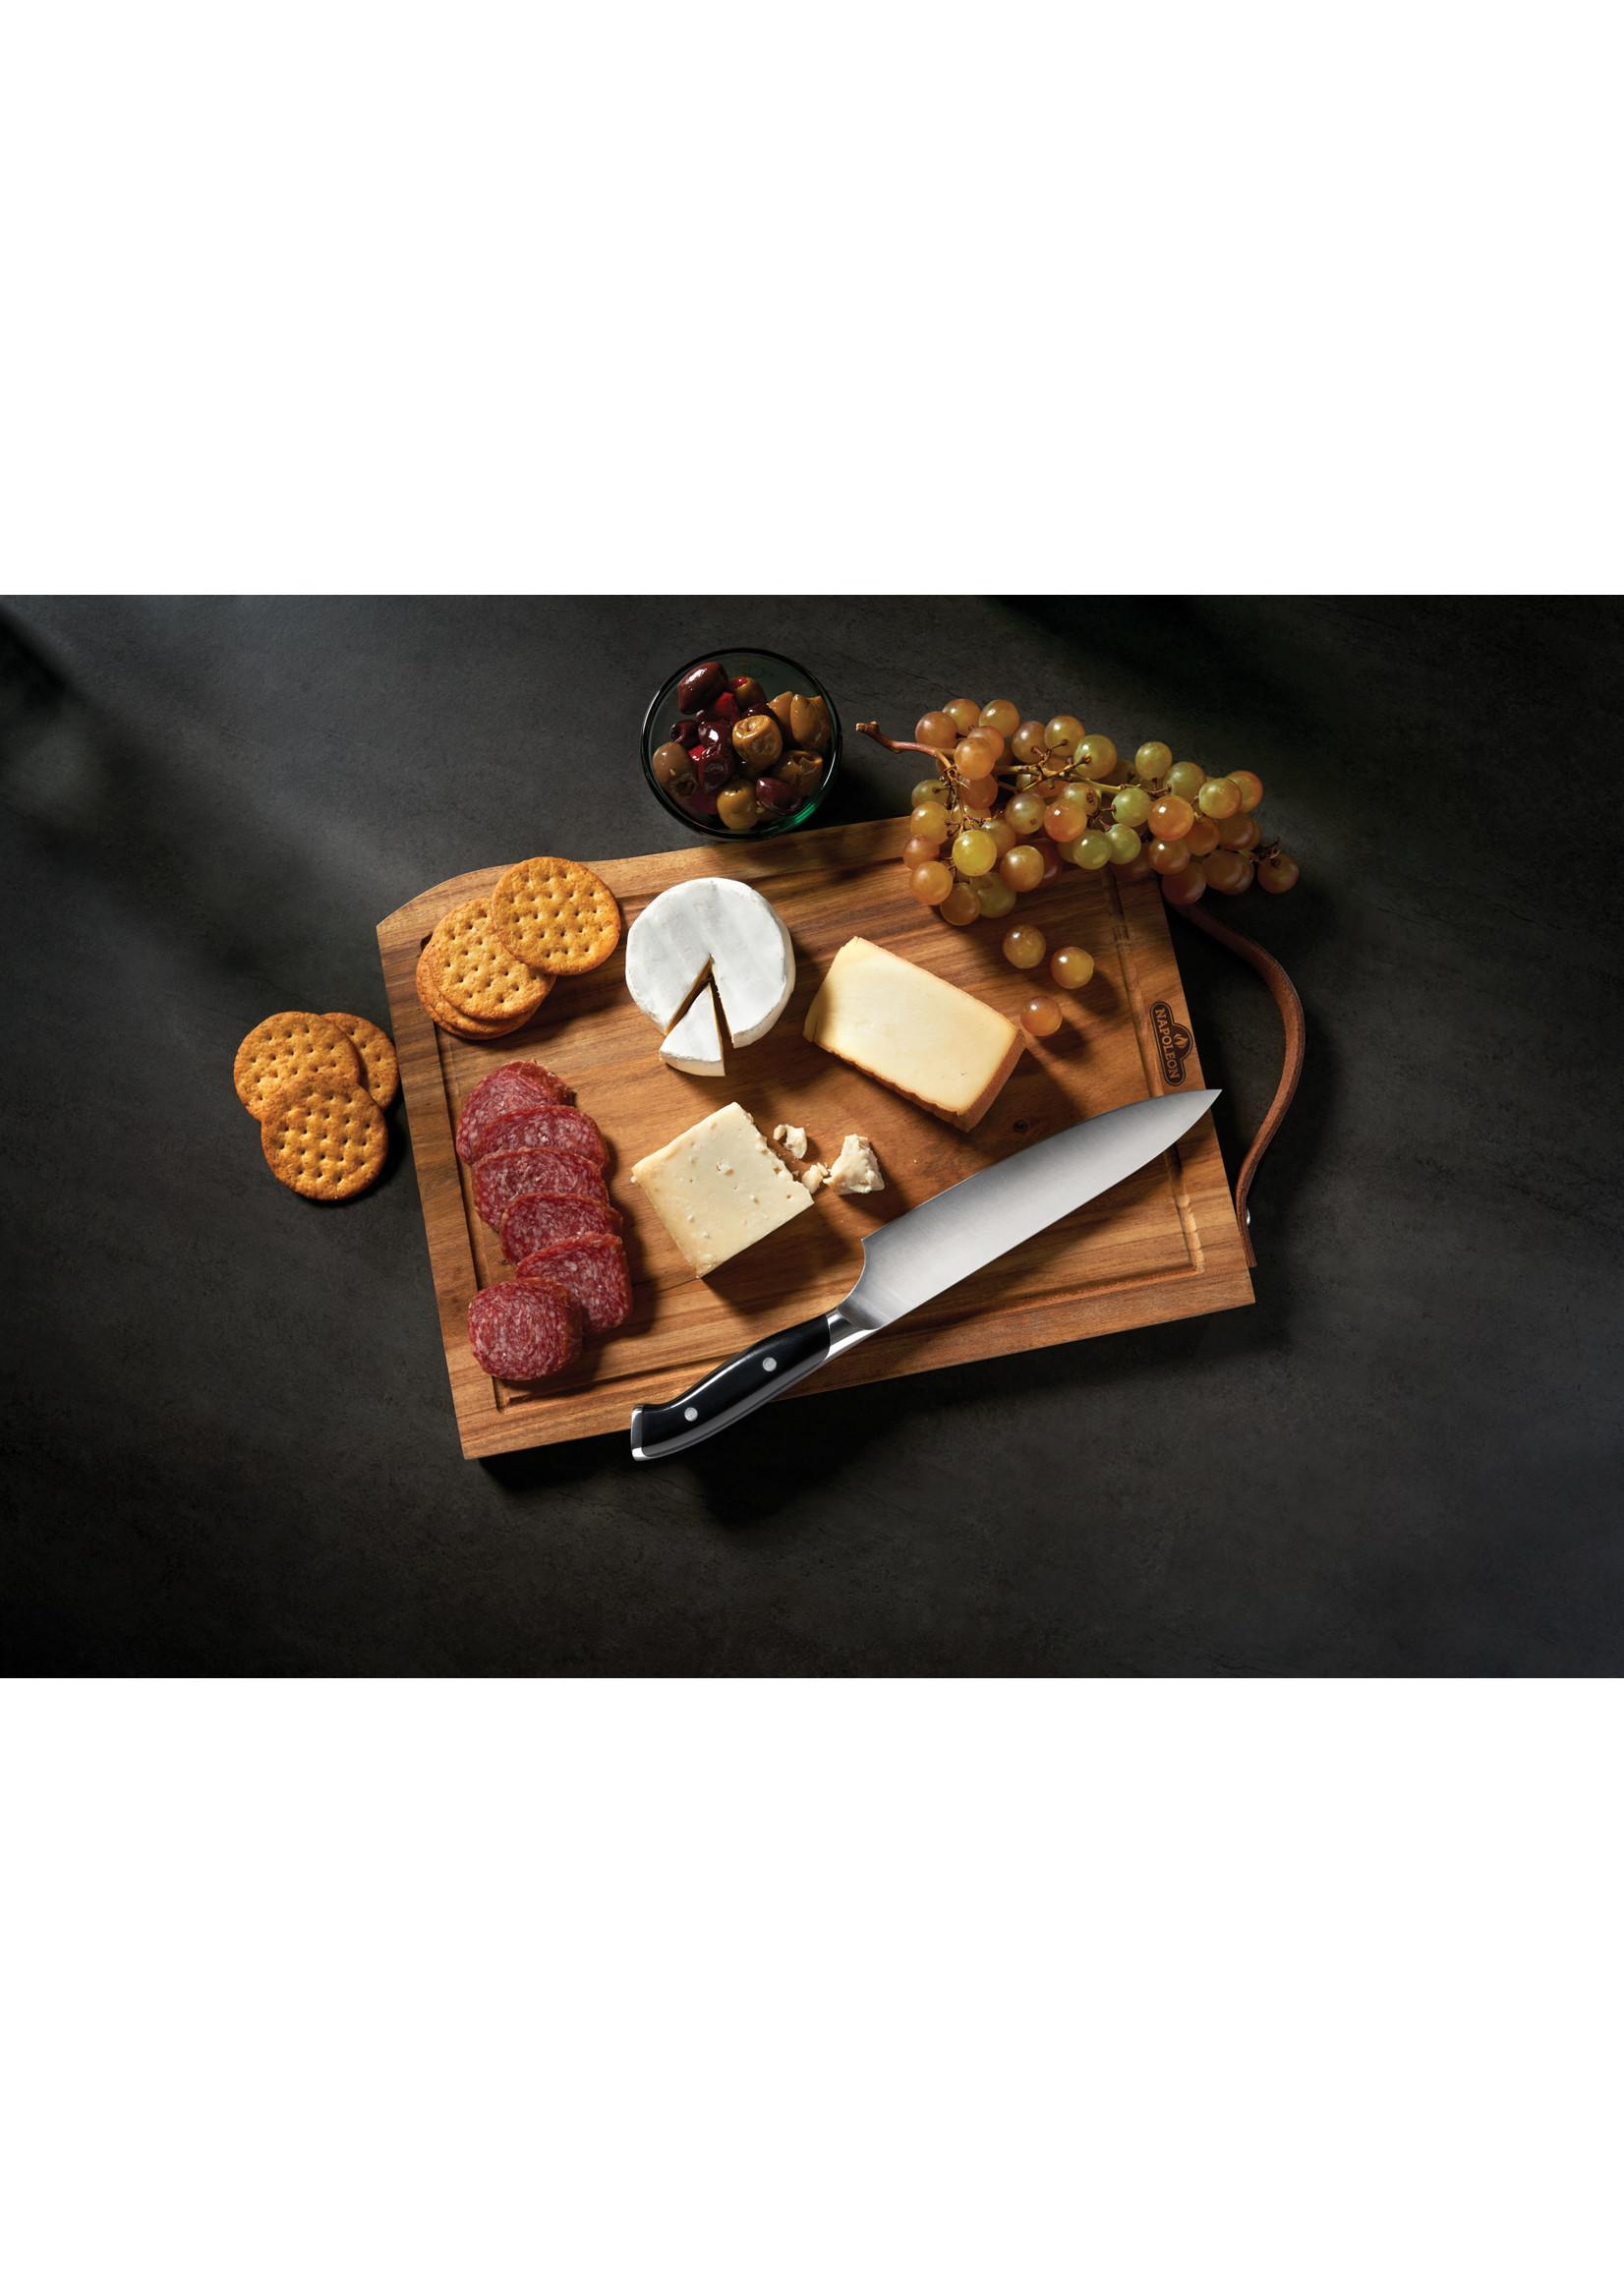 Napoleon Napoleon® President limited edition snijplank met chef mes